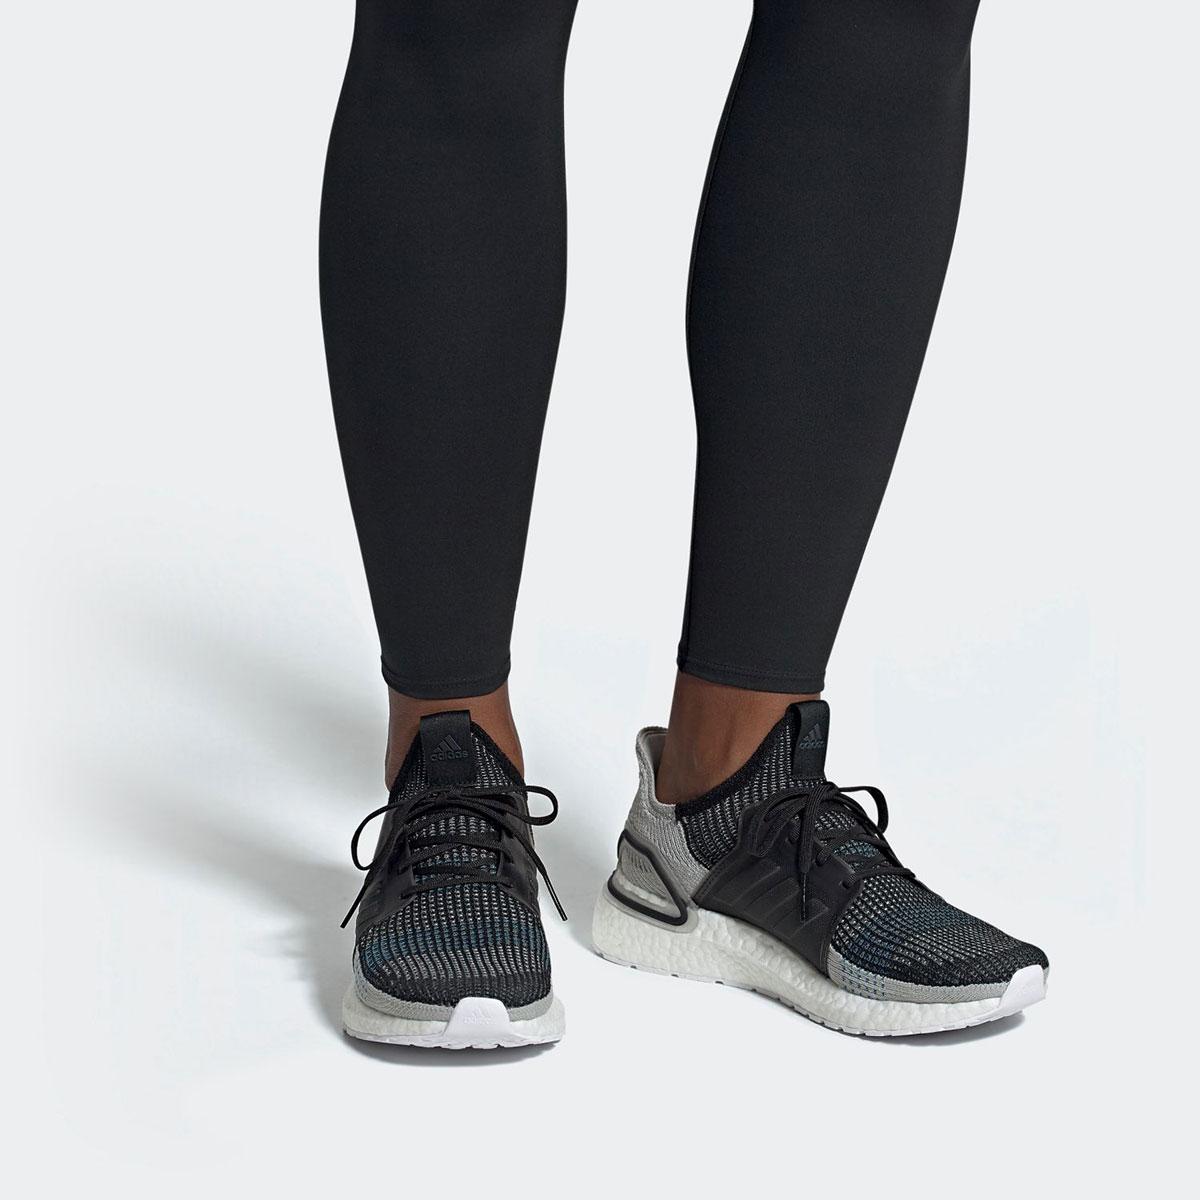 reputable site 3d10a 74c2b adidas UltraBOOST 19 (CORE BLACK GREY SIX SHOCK CYAN) (Adidas ultra boost 19 )